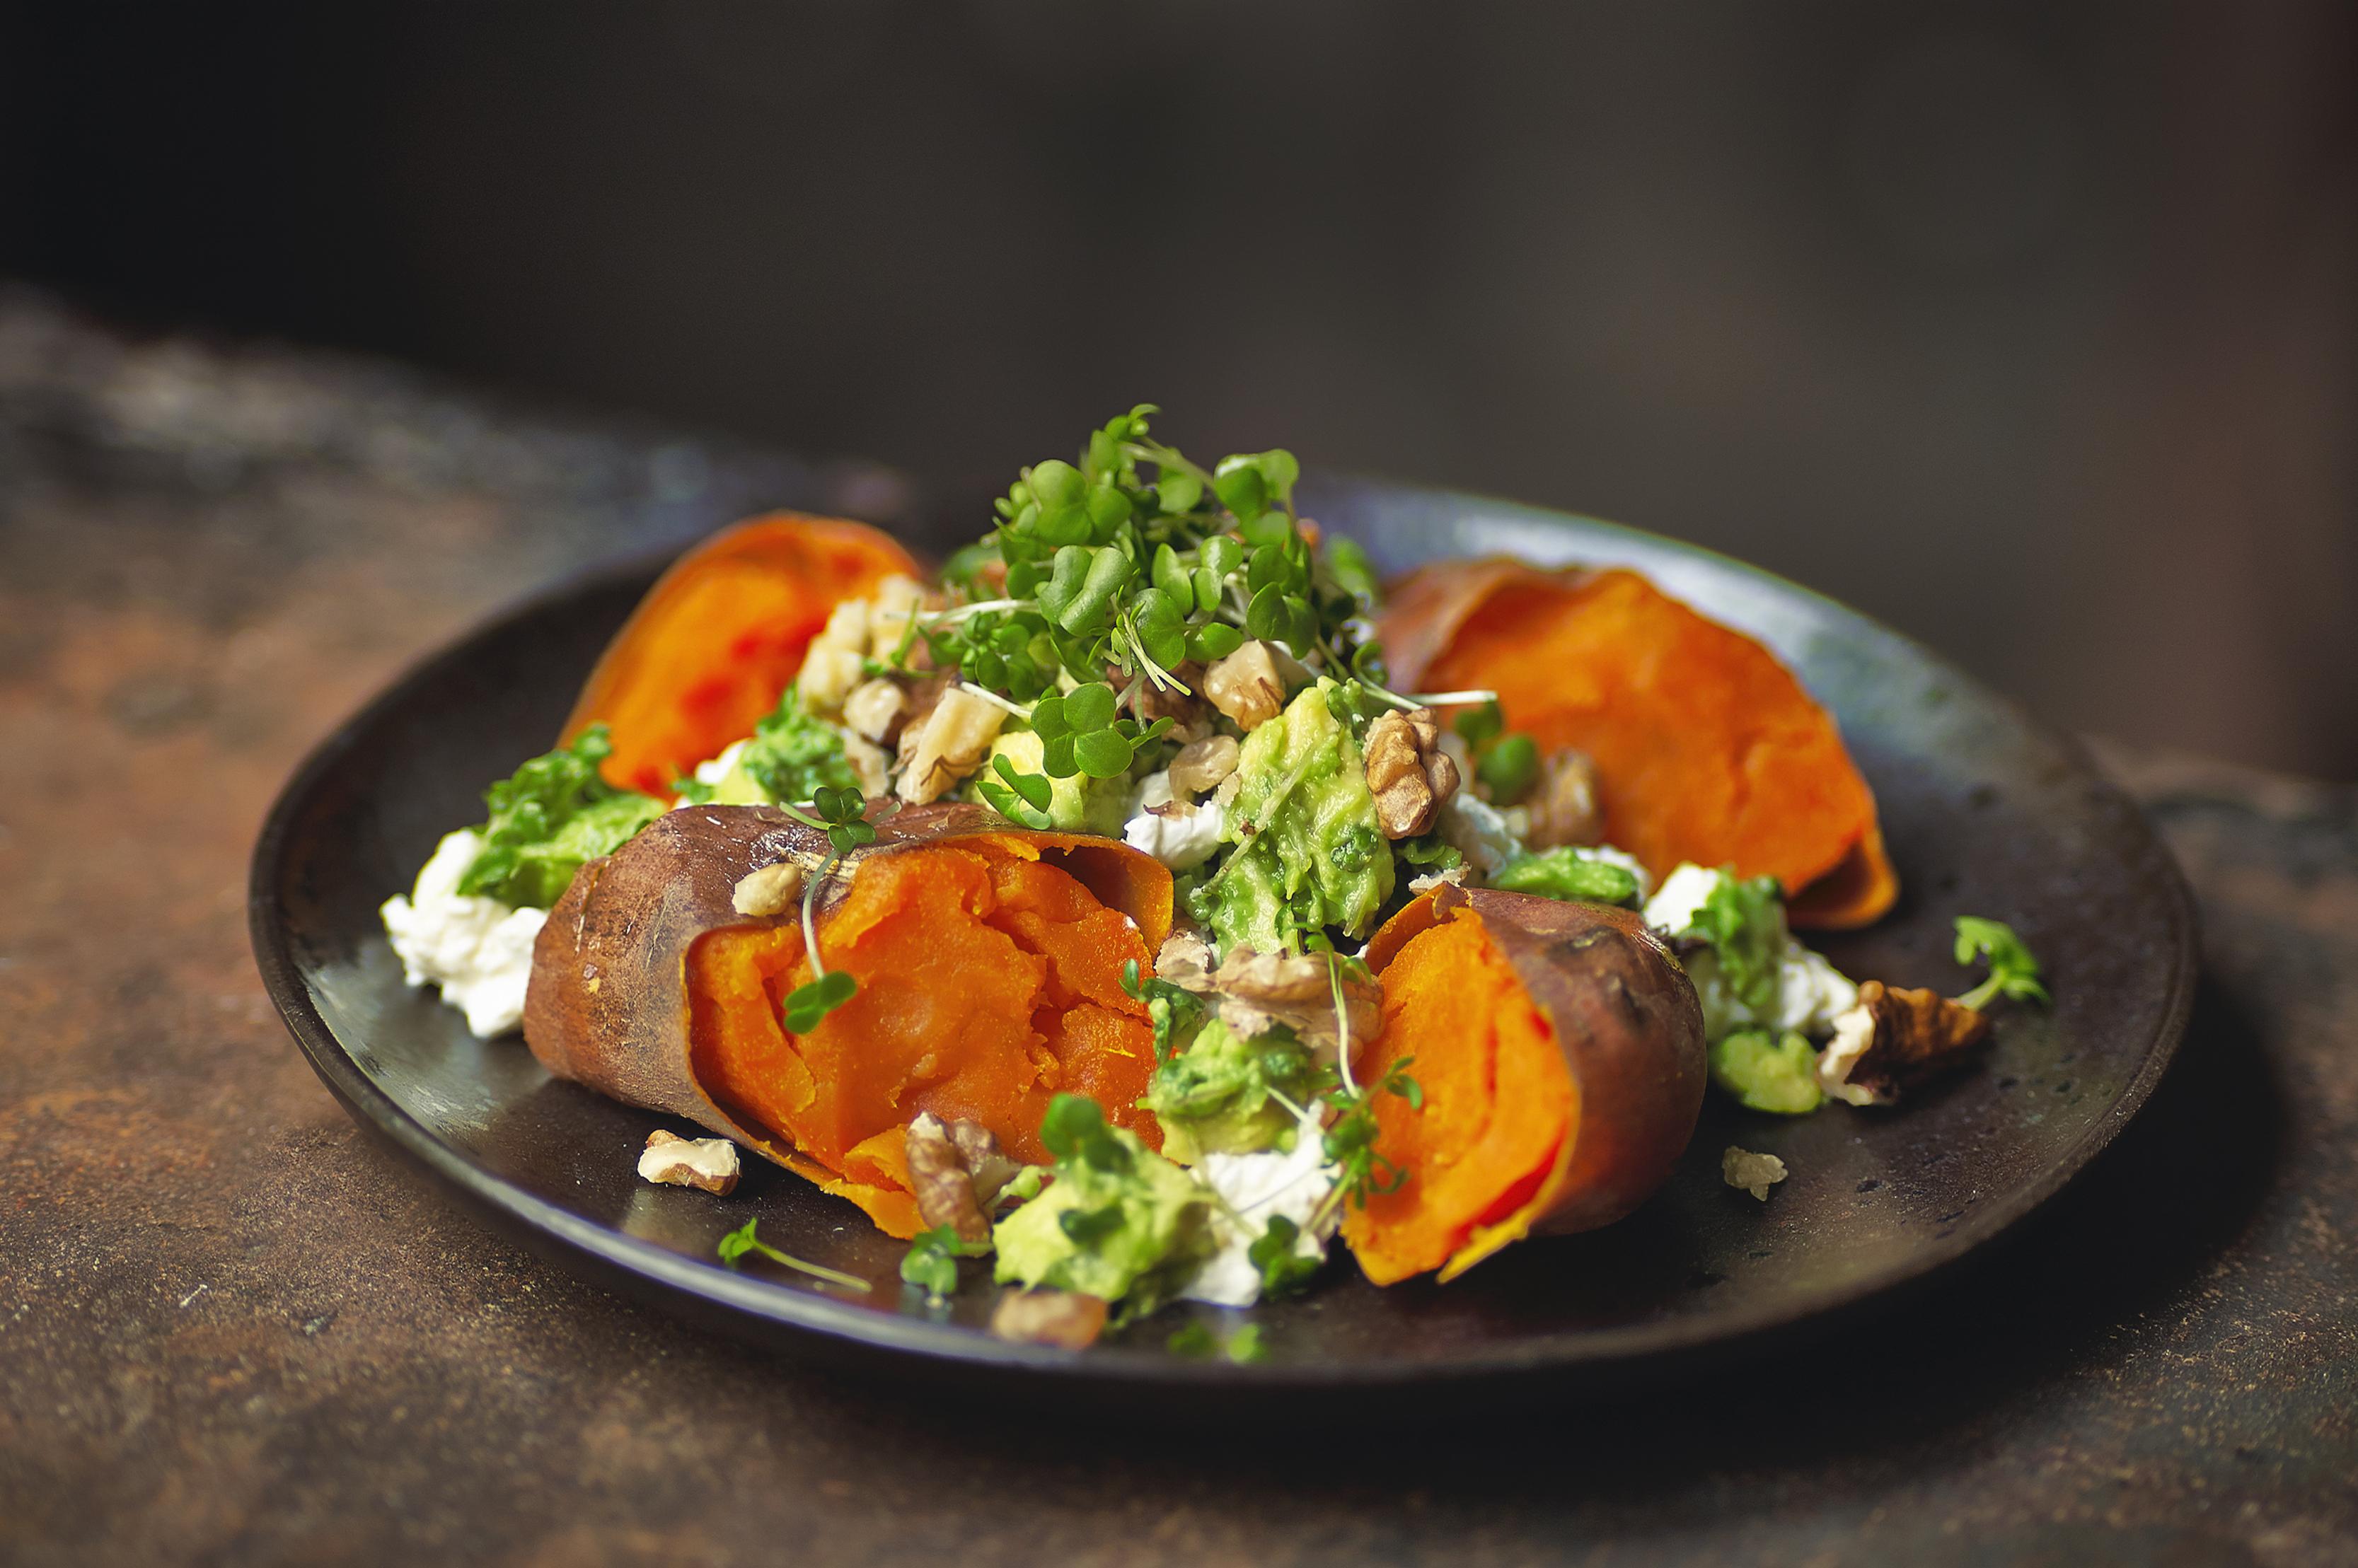 Baked Sweet Potato with Salad Cress, Cottage & Avocado